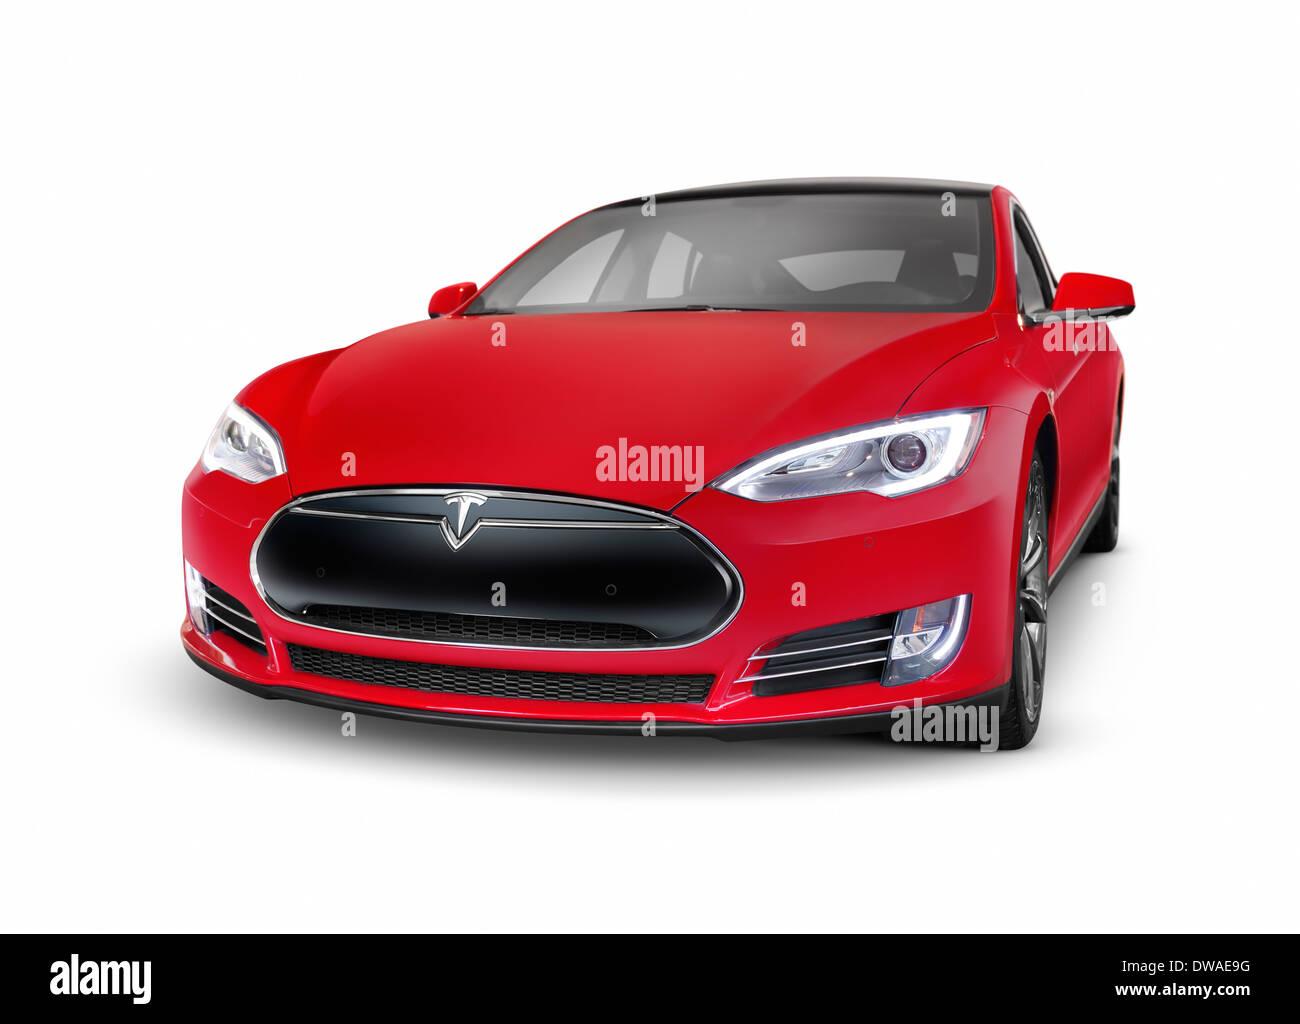 red 2014 tesla model s luxury electric car premium sedan isolated on stock photo royalty free. Black Bedroom Furniture Sets. Home Design Ideas